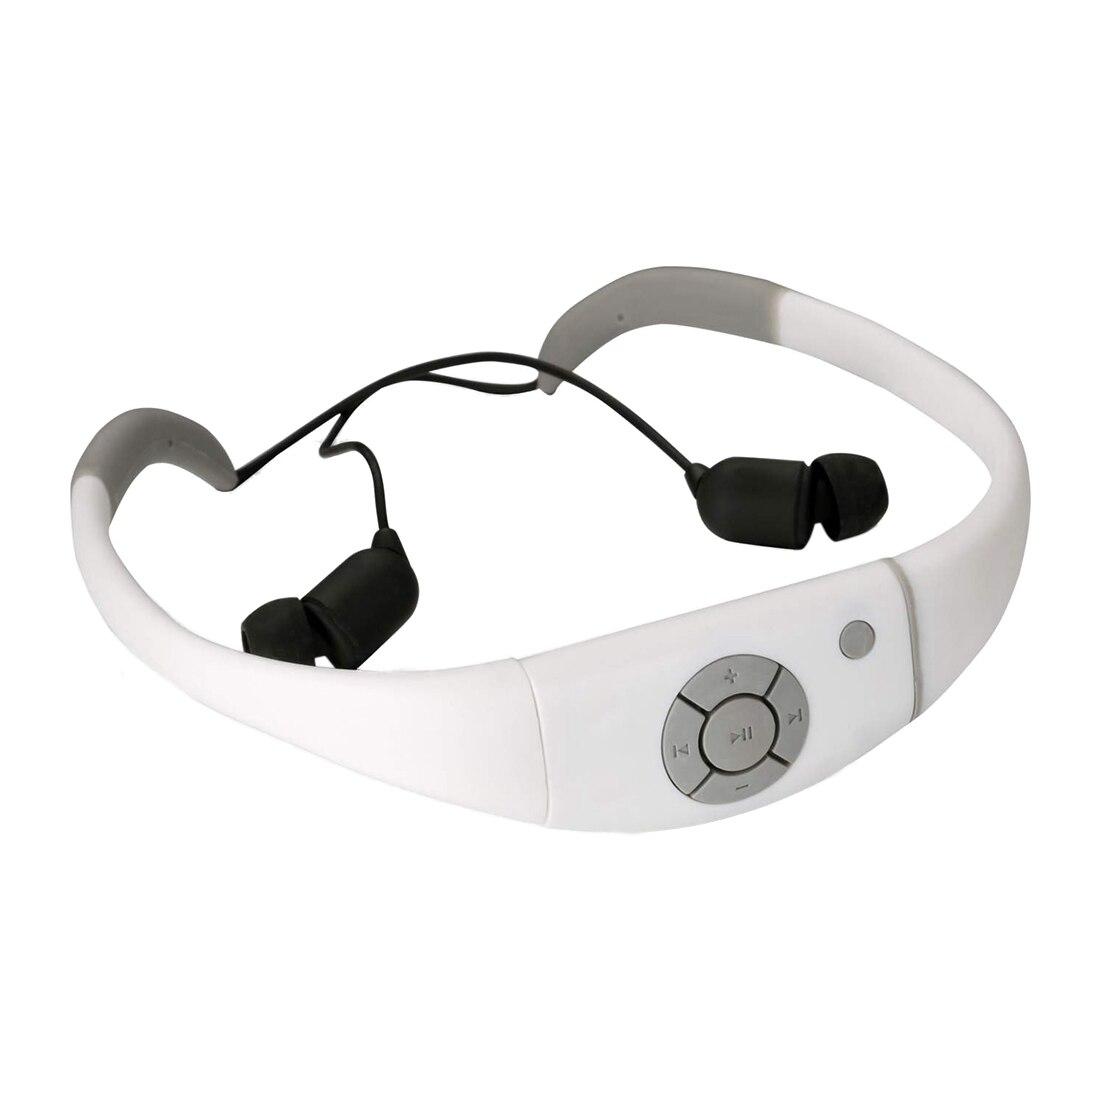 Waterproof Mp3 Headset Music Player 8gb Memory Hi-fi Stero Earphone with Fm Radio